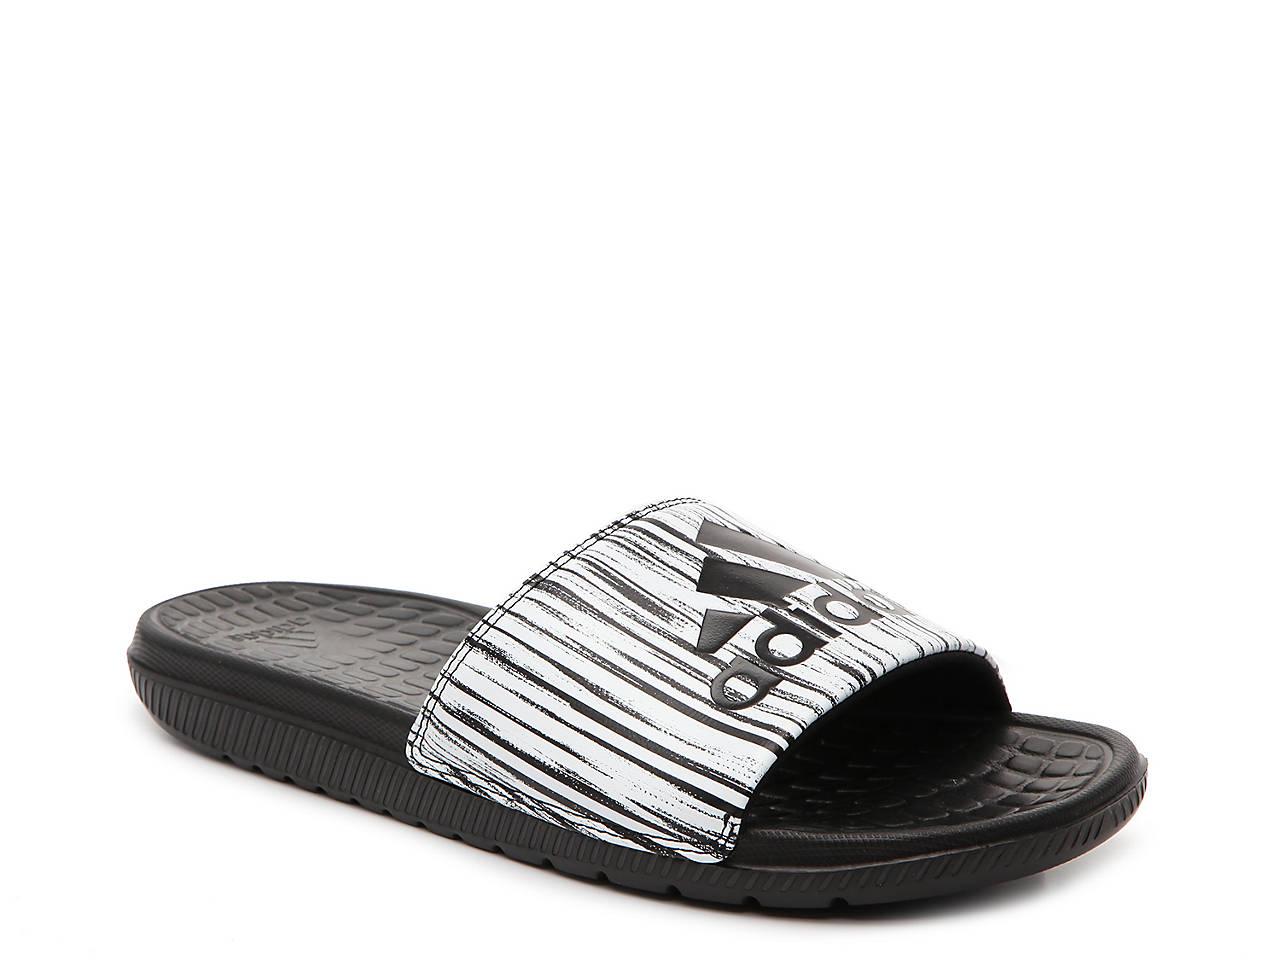 new product 3021b 70afa adidas. Voloomix GR Slide Sandal - Men s